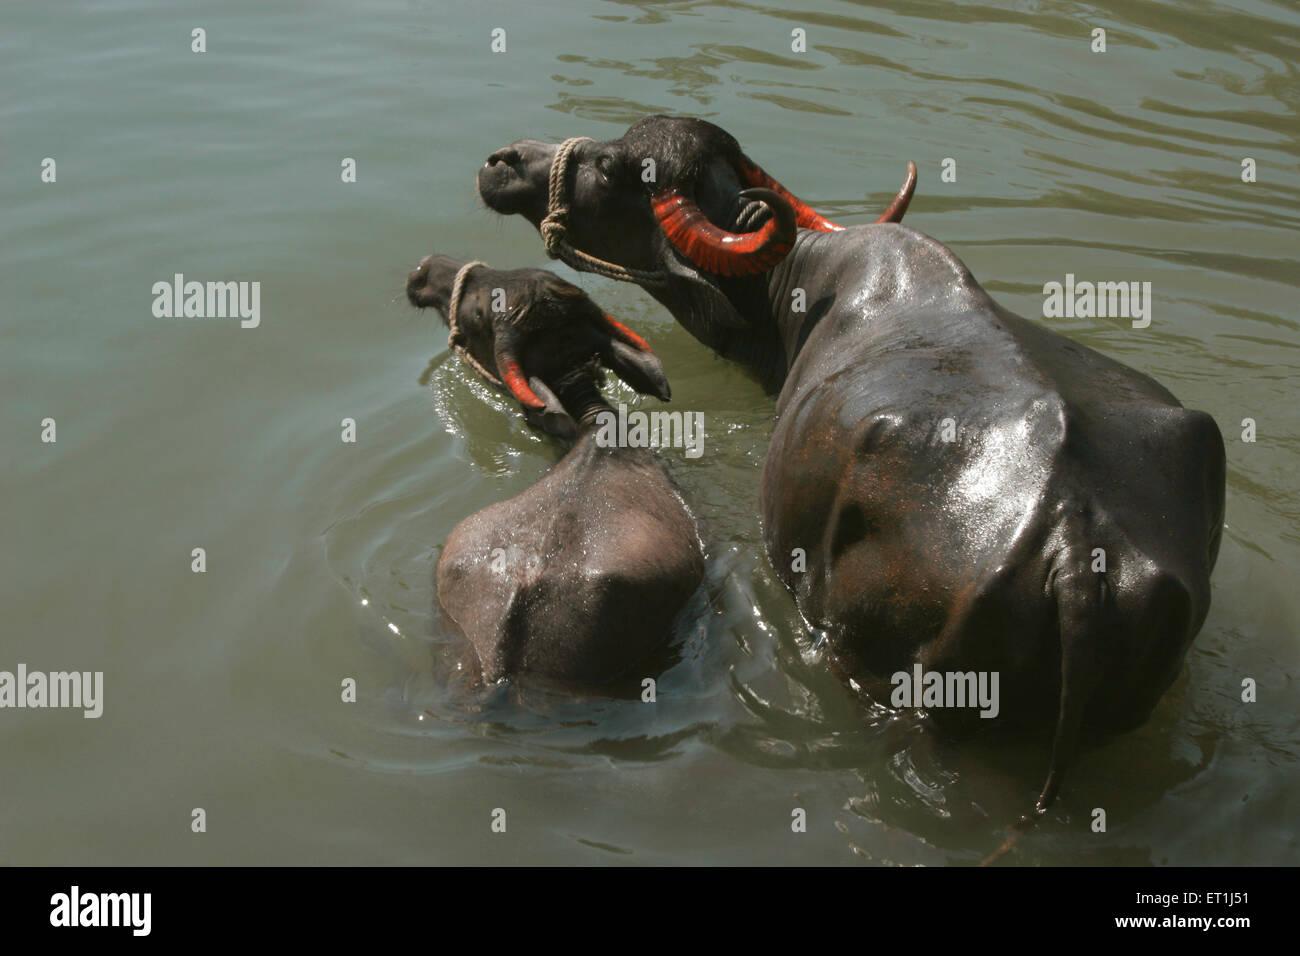 Black buffalos mother and young swimming and bathing in green waters of river Krishna ; Menauli ; Wai ; Maharashtra - Stock Image